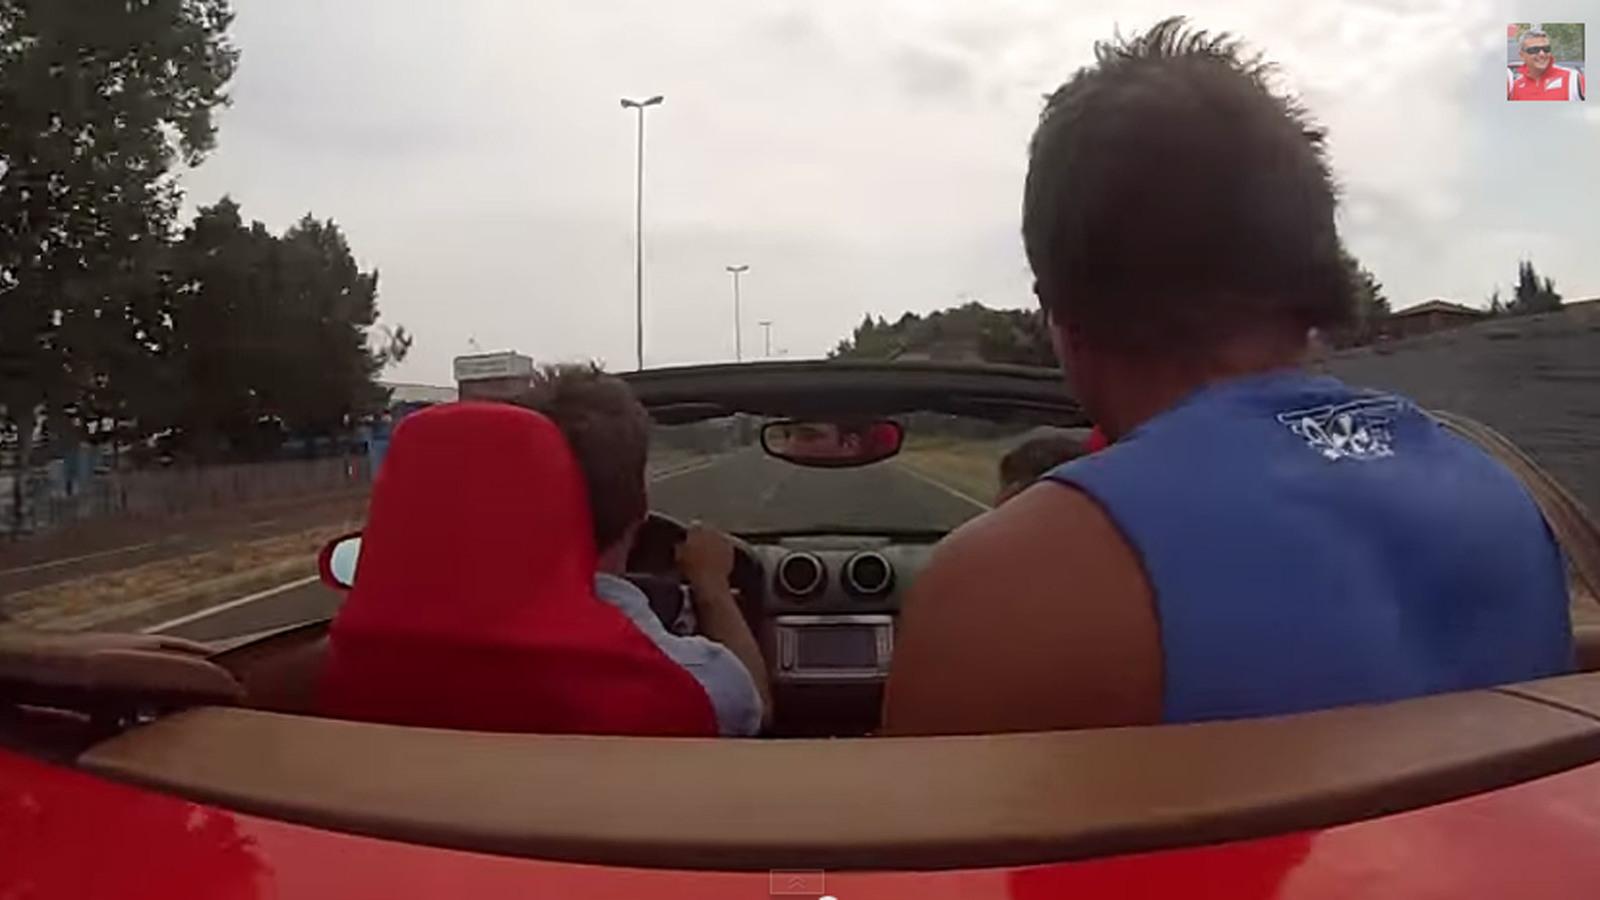 Ferrari test drive in Maranello moments before crash